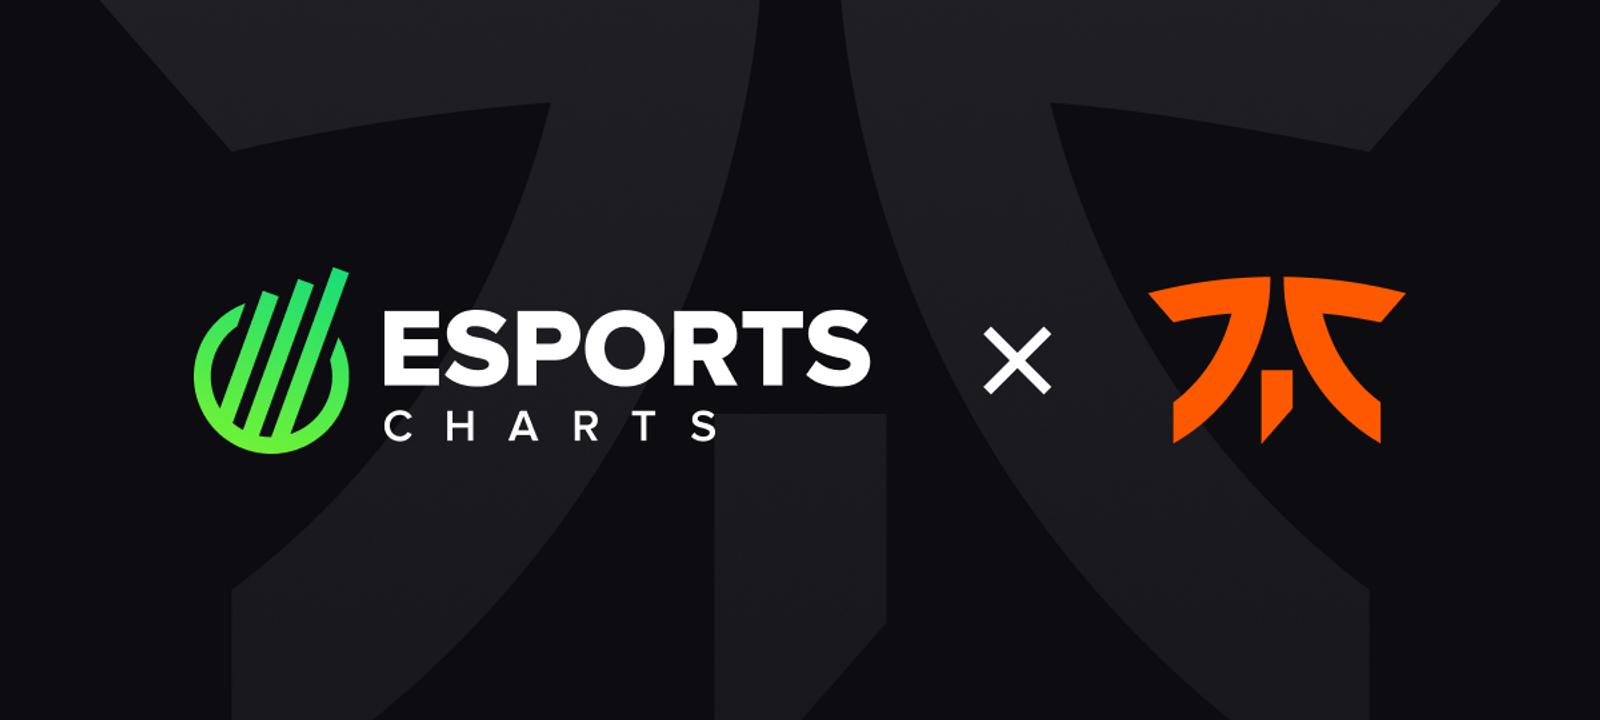 Fnatic renews partnership with Esports Charts